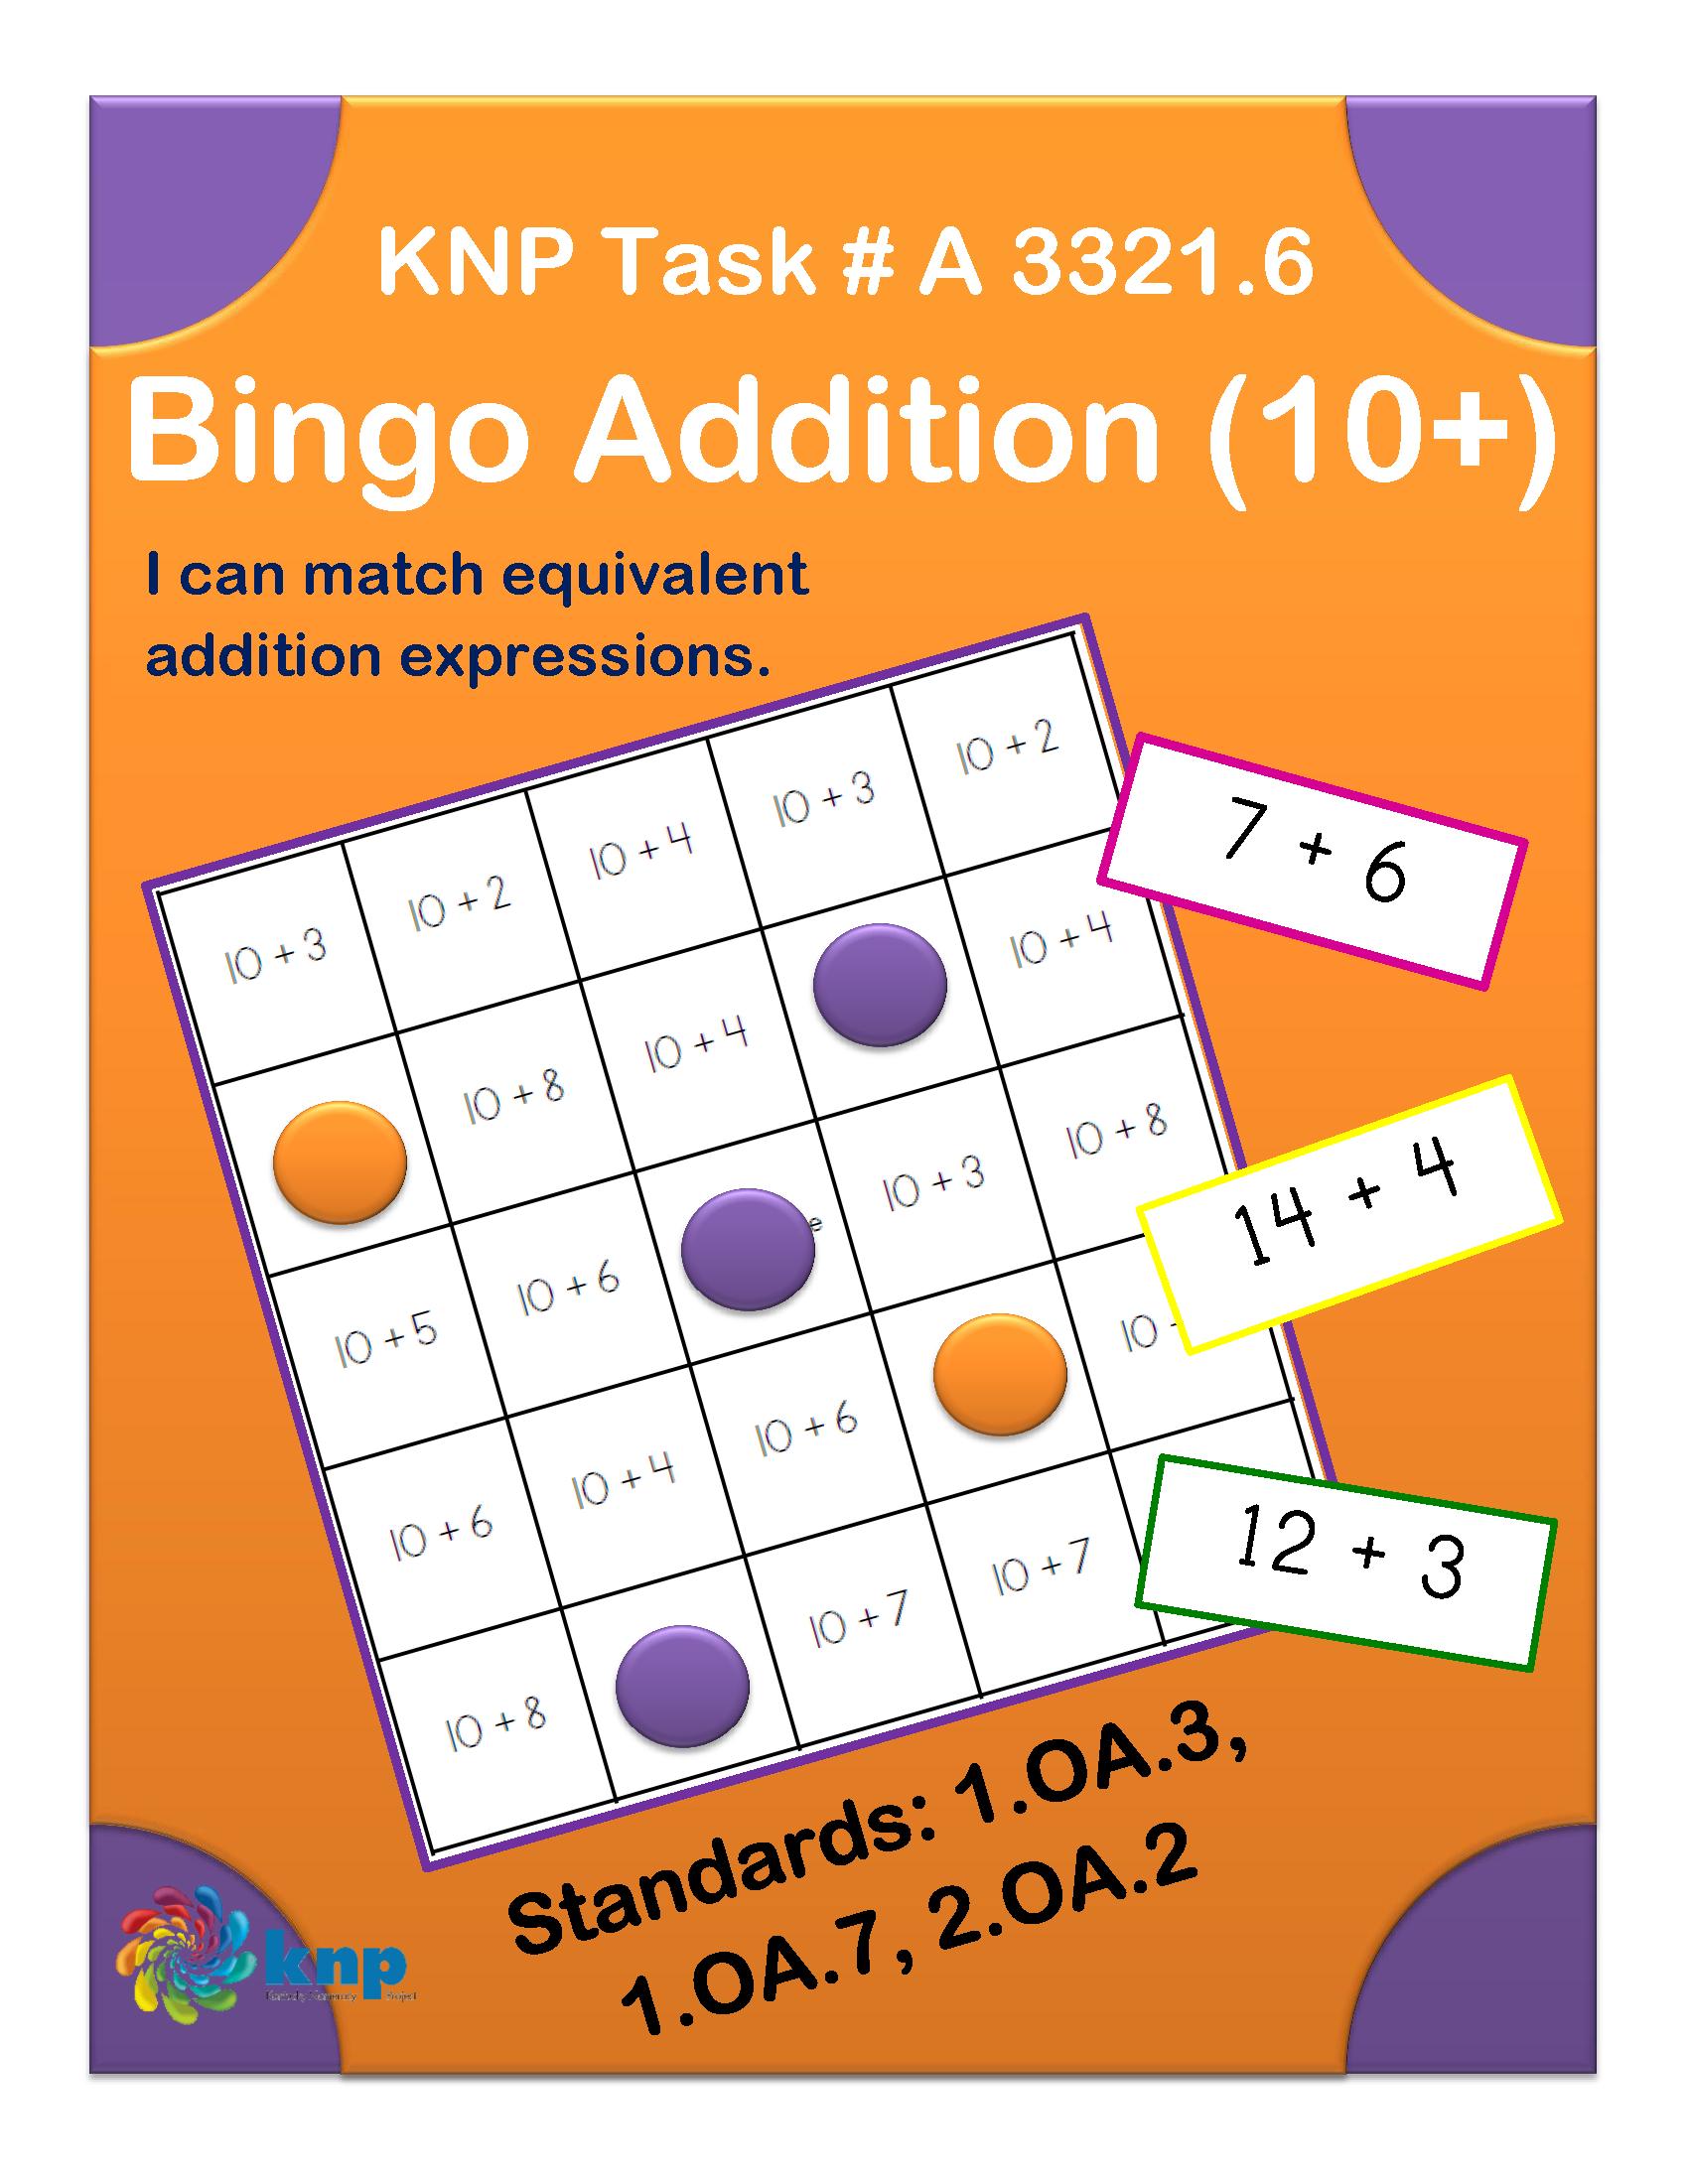 Bingo Addition 10